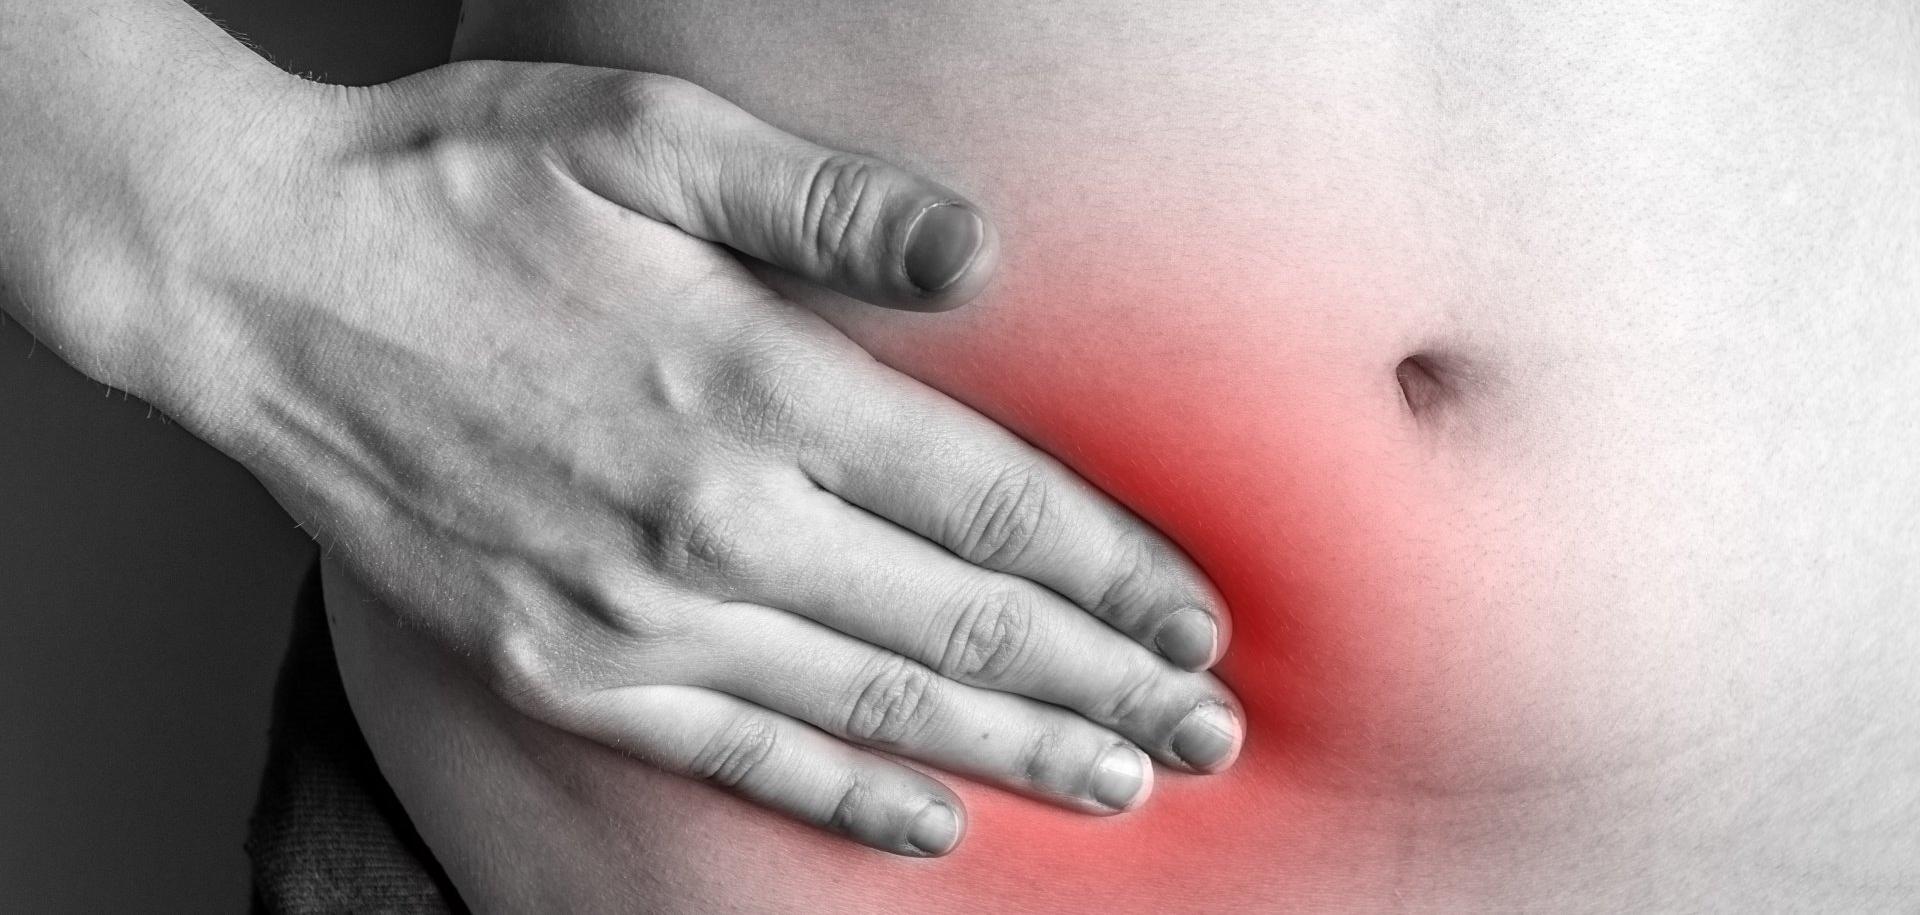 Preventing a Hernia